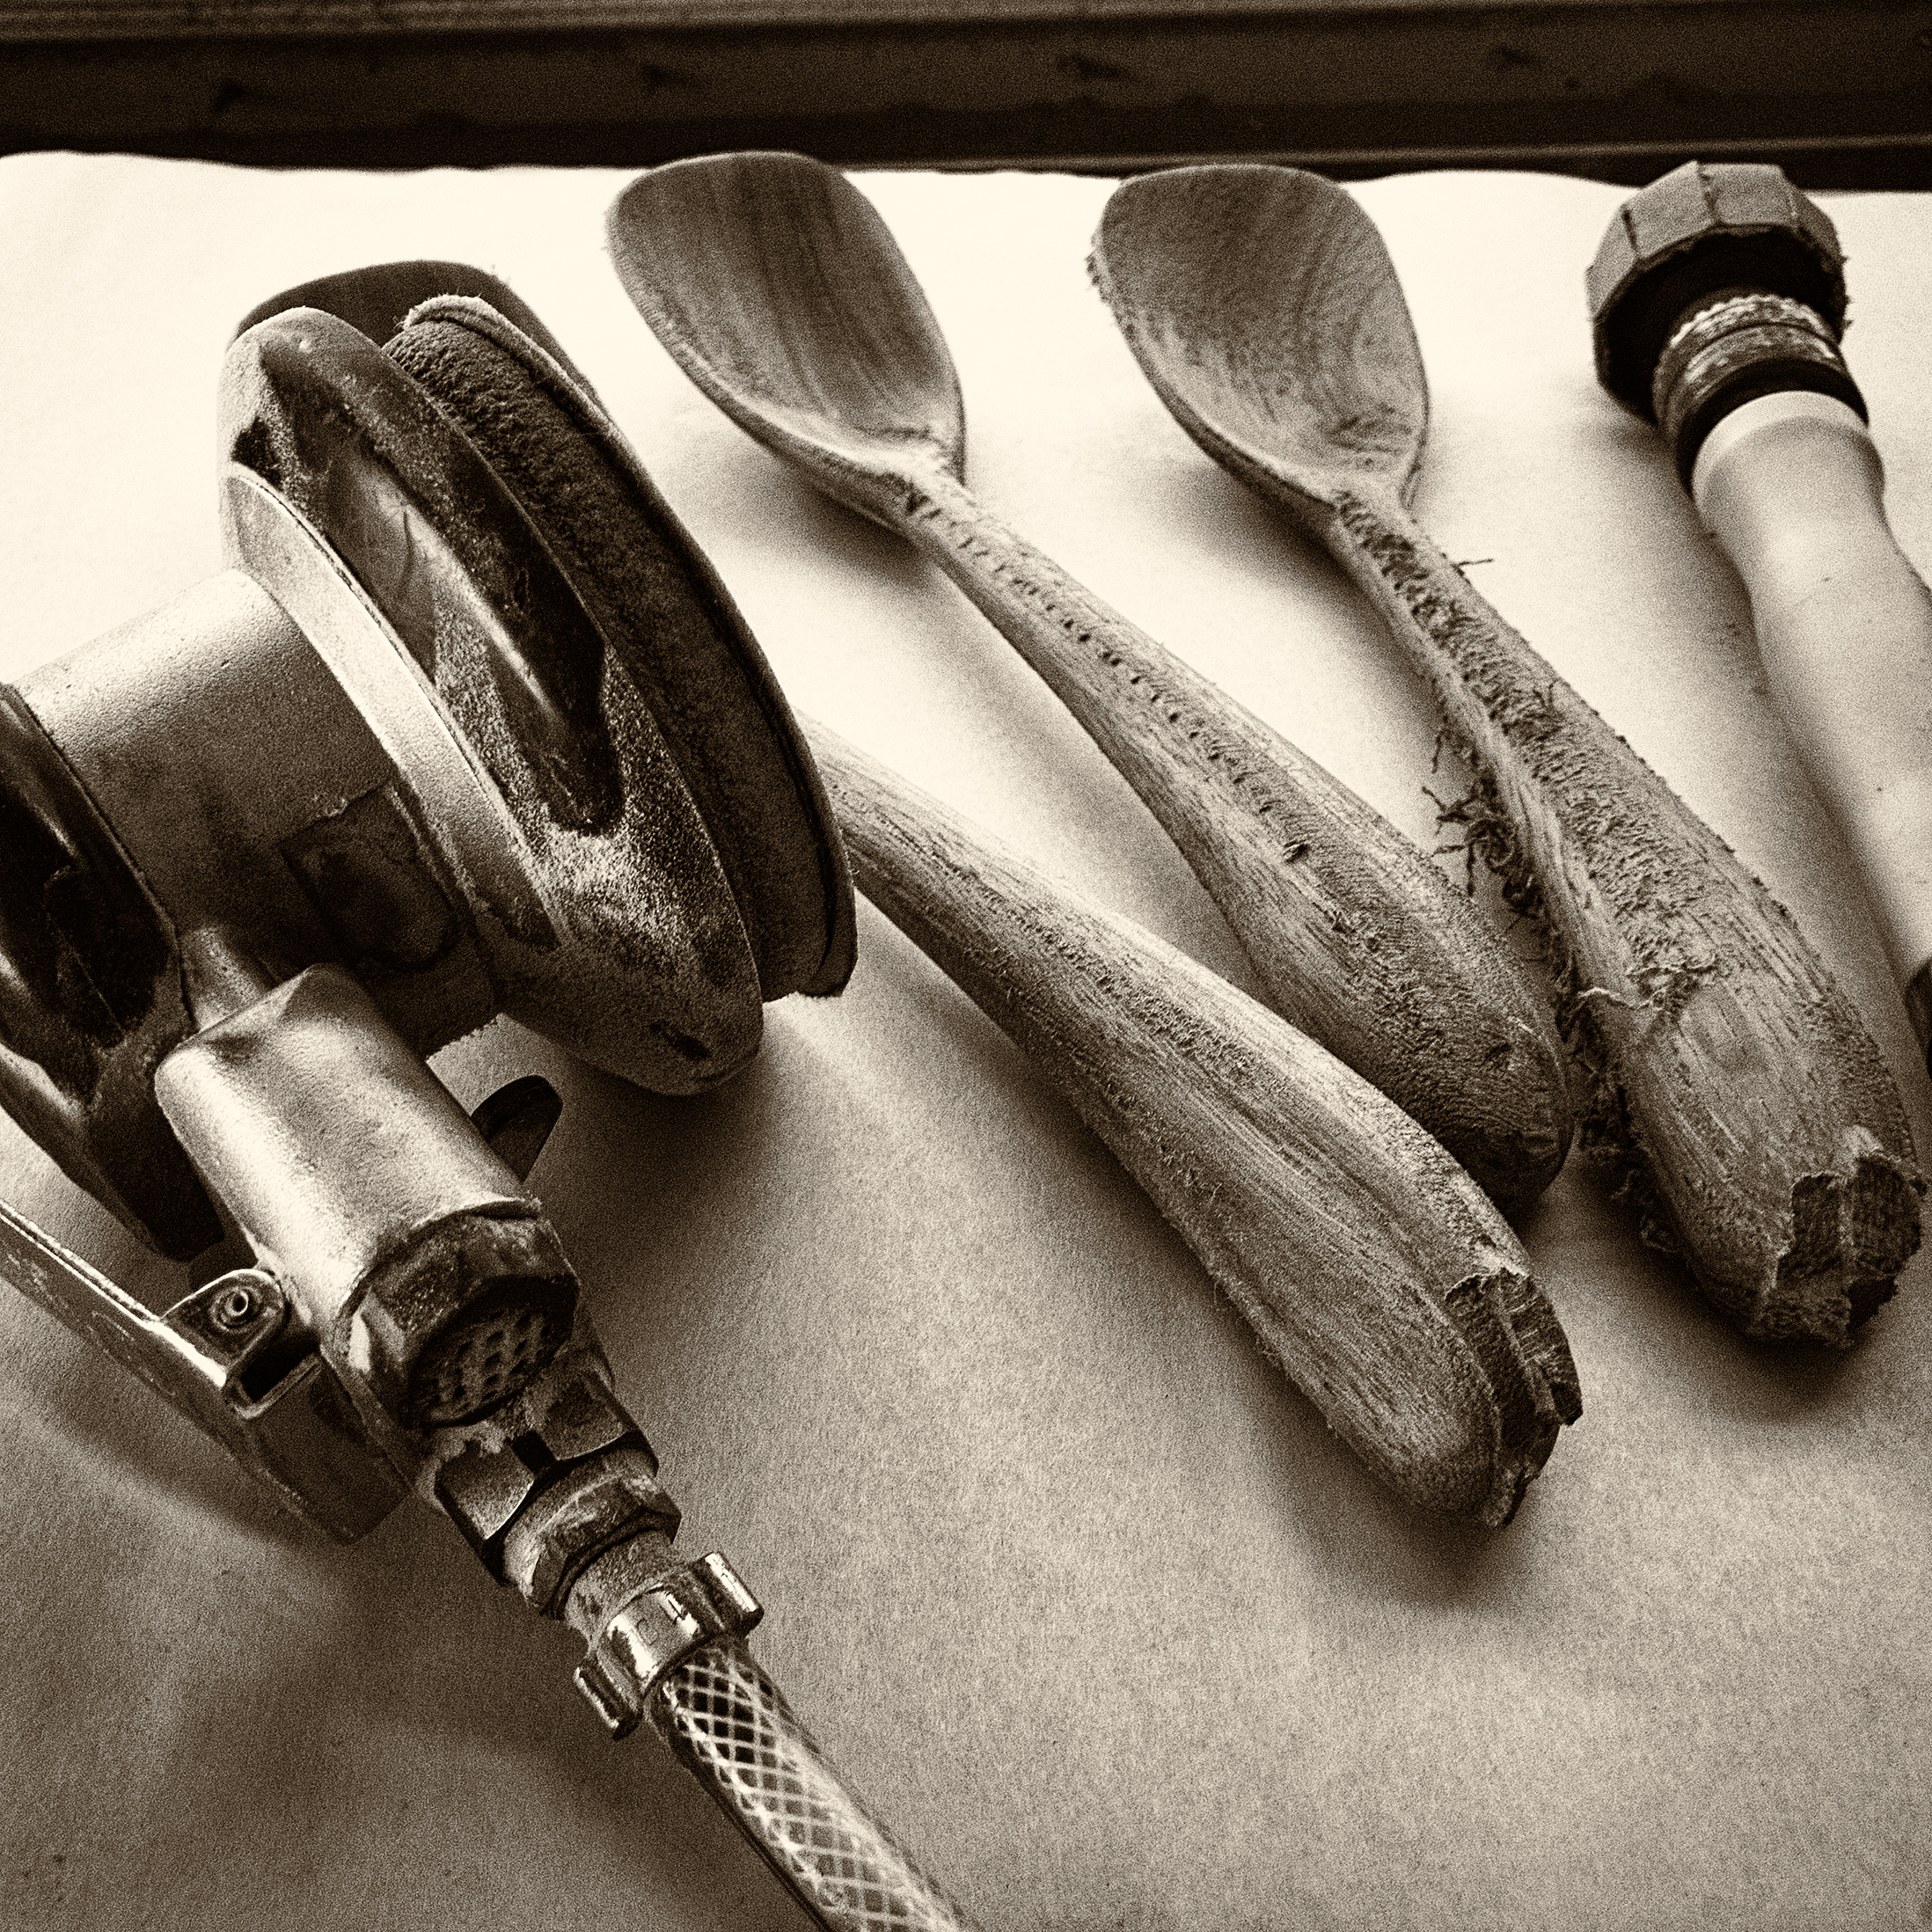 Handmade spoons on the bench ready for sanding. Work in Progress by Bob Gilmour, Australia - Gilmour Design.